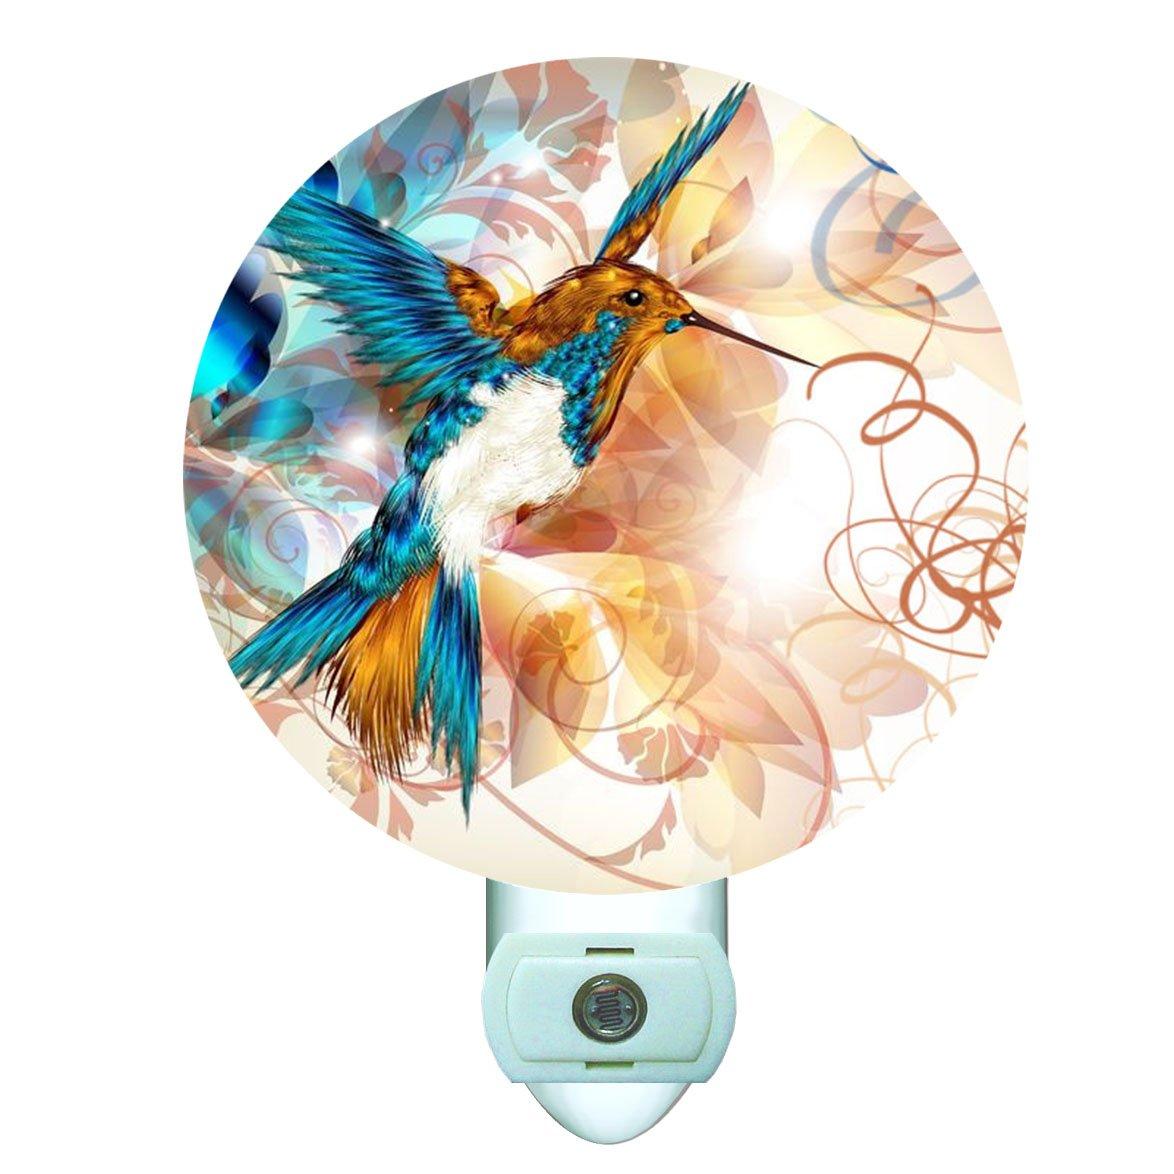 Abstract Hummingbird Decorative Round Night Light by Gotham Decor (Image #1)